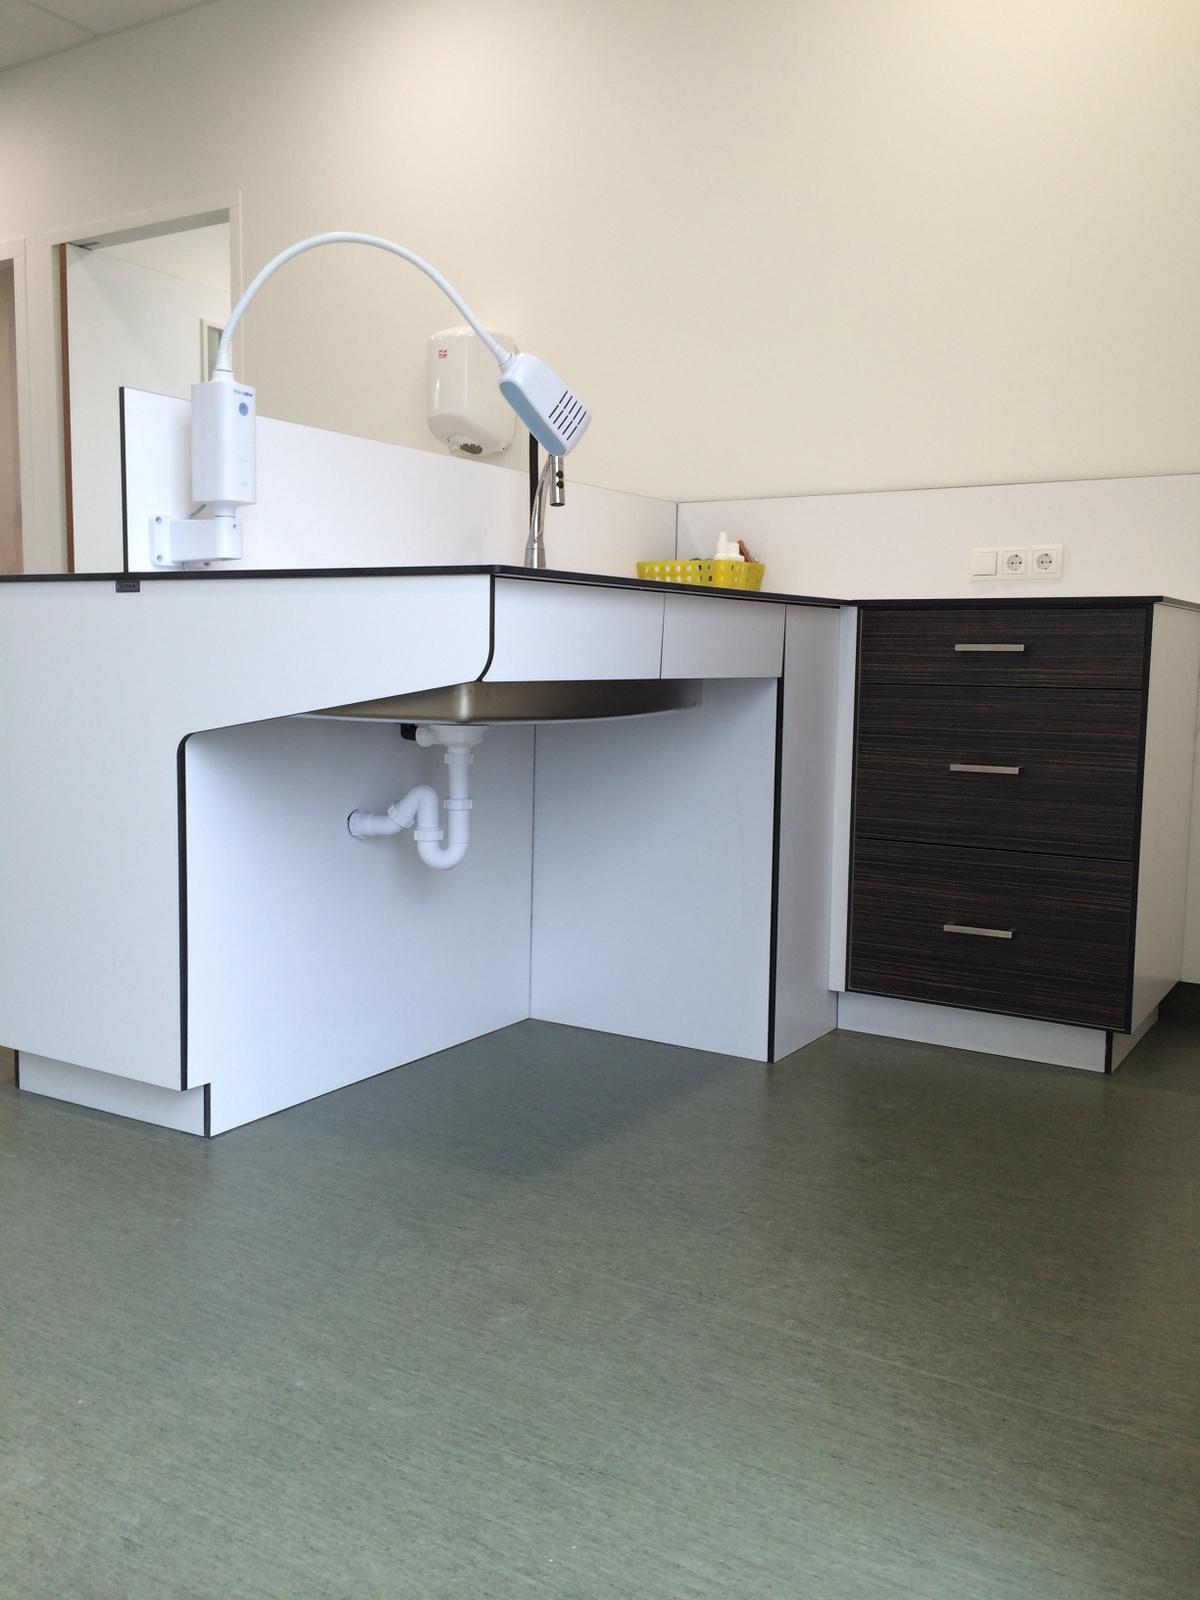 Under Bench Cabinets - iab Lab